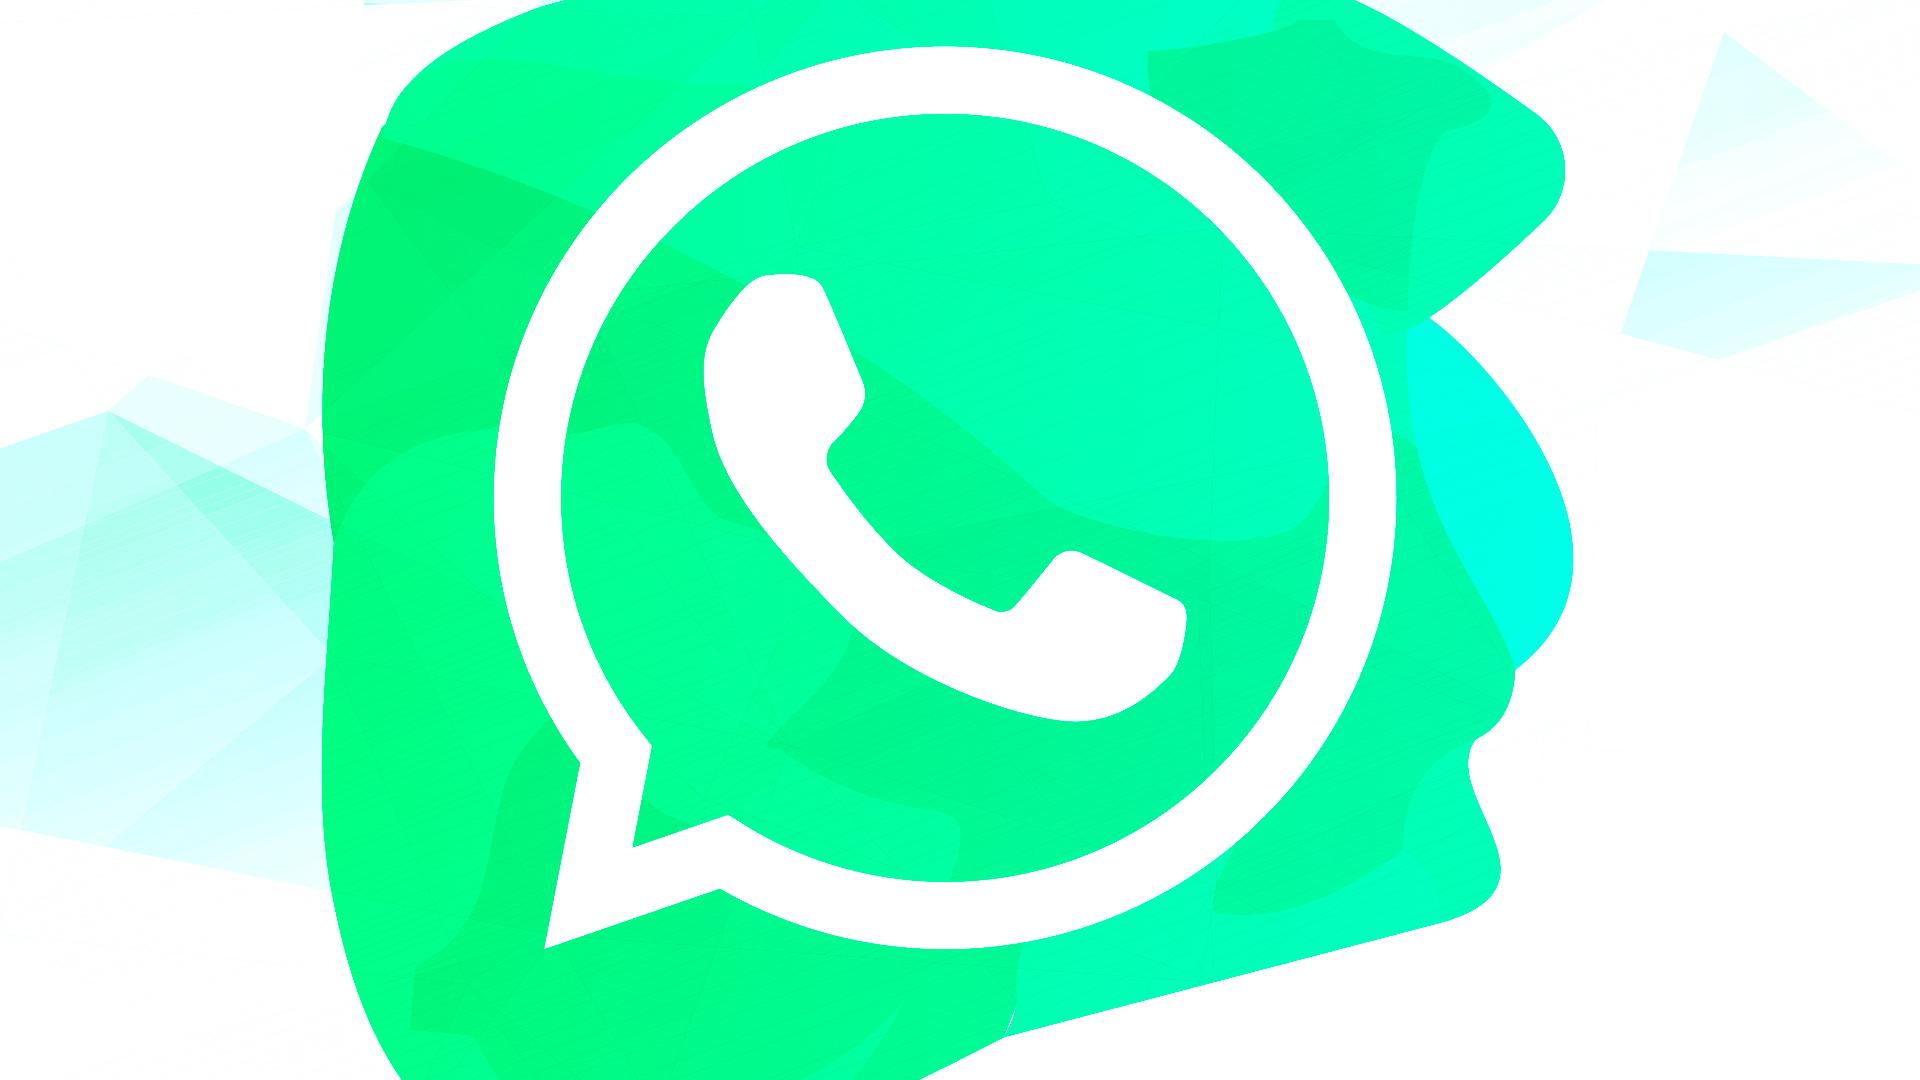 Smartphone, App, Social Network, Messenger, Handy, soziales Netzwerk, Chat, Kommunikation, Instant Messenger, whatsapp, Instant Messaging, WhatsApp Logo